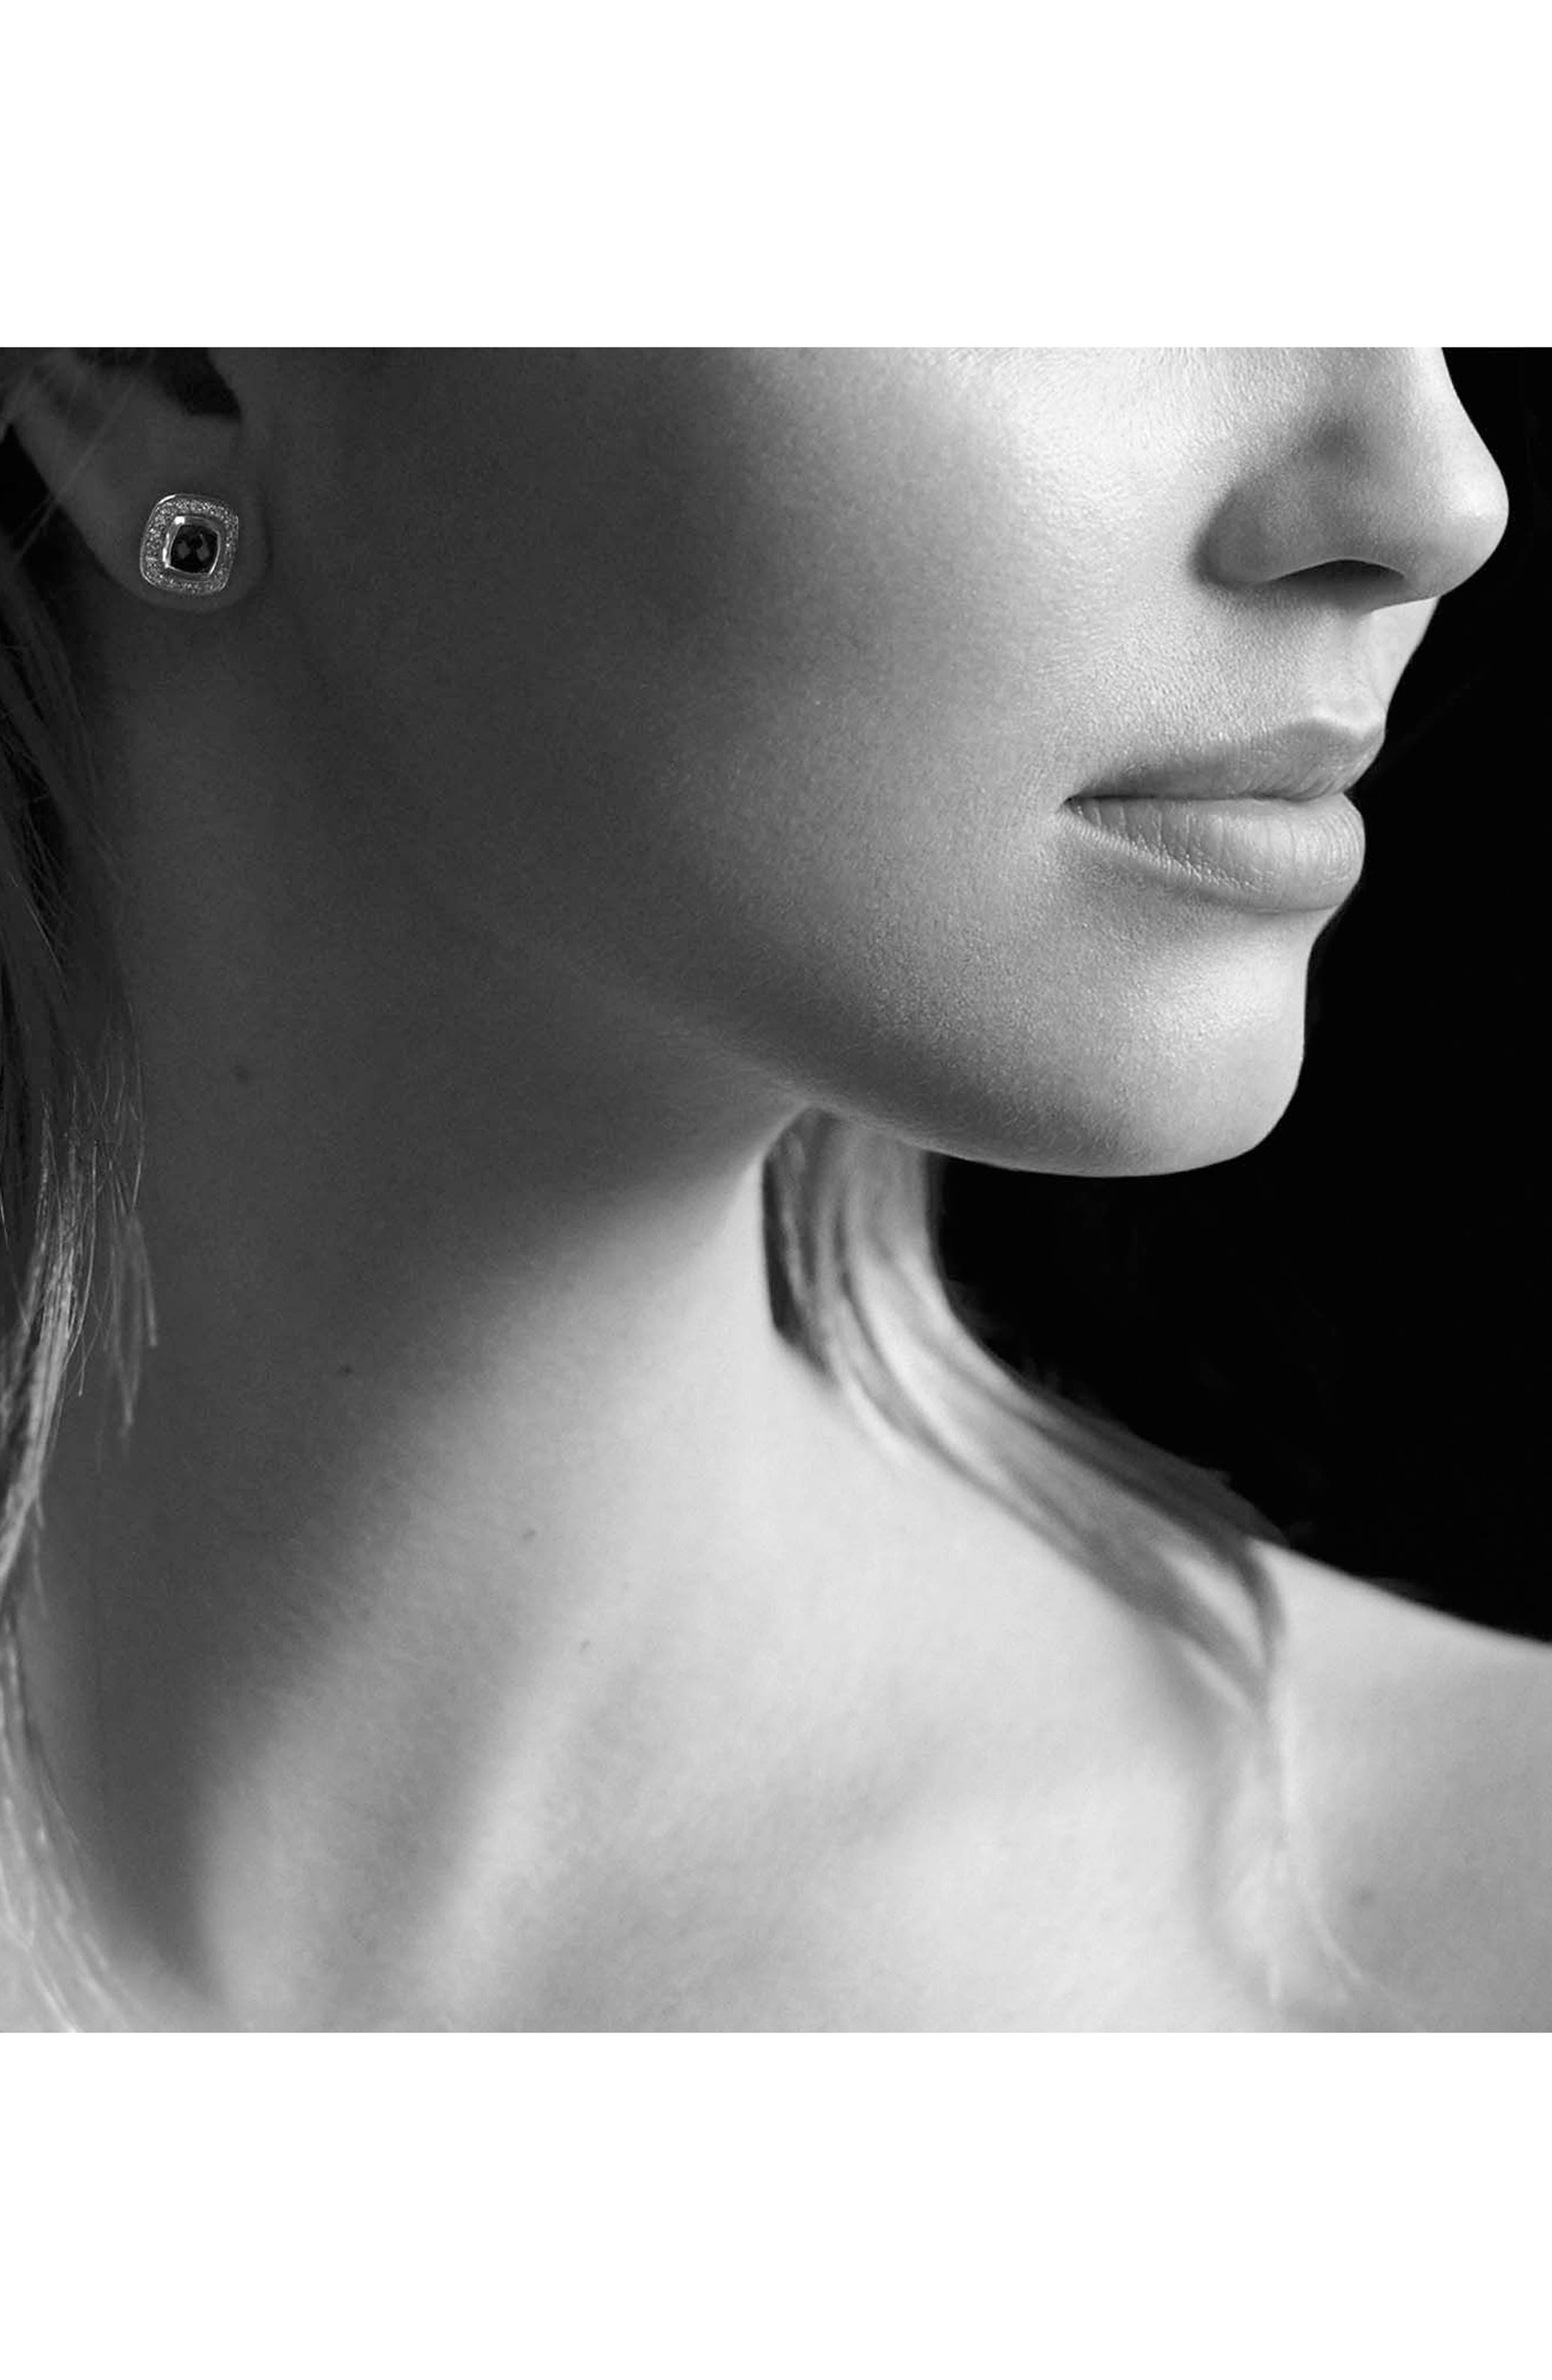 'Albion' Petite Earrings with Diamonds,                             Alternate thumbnail 2, color,                             BLUE TOPAZ